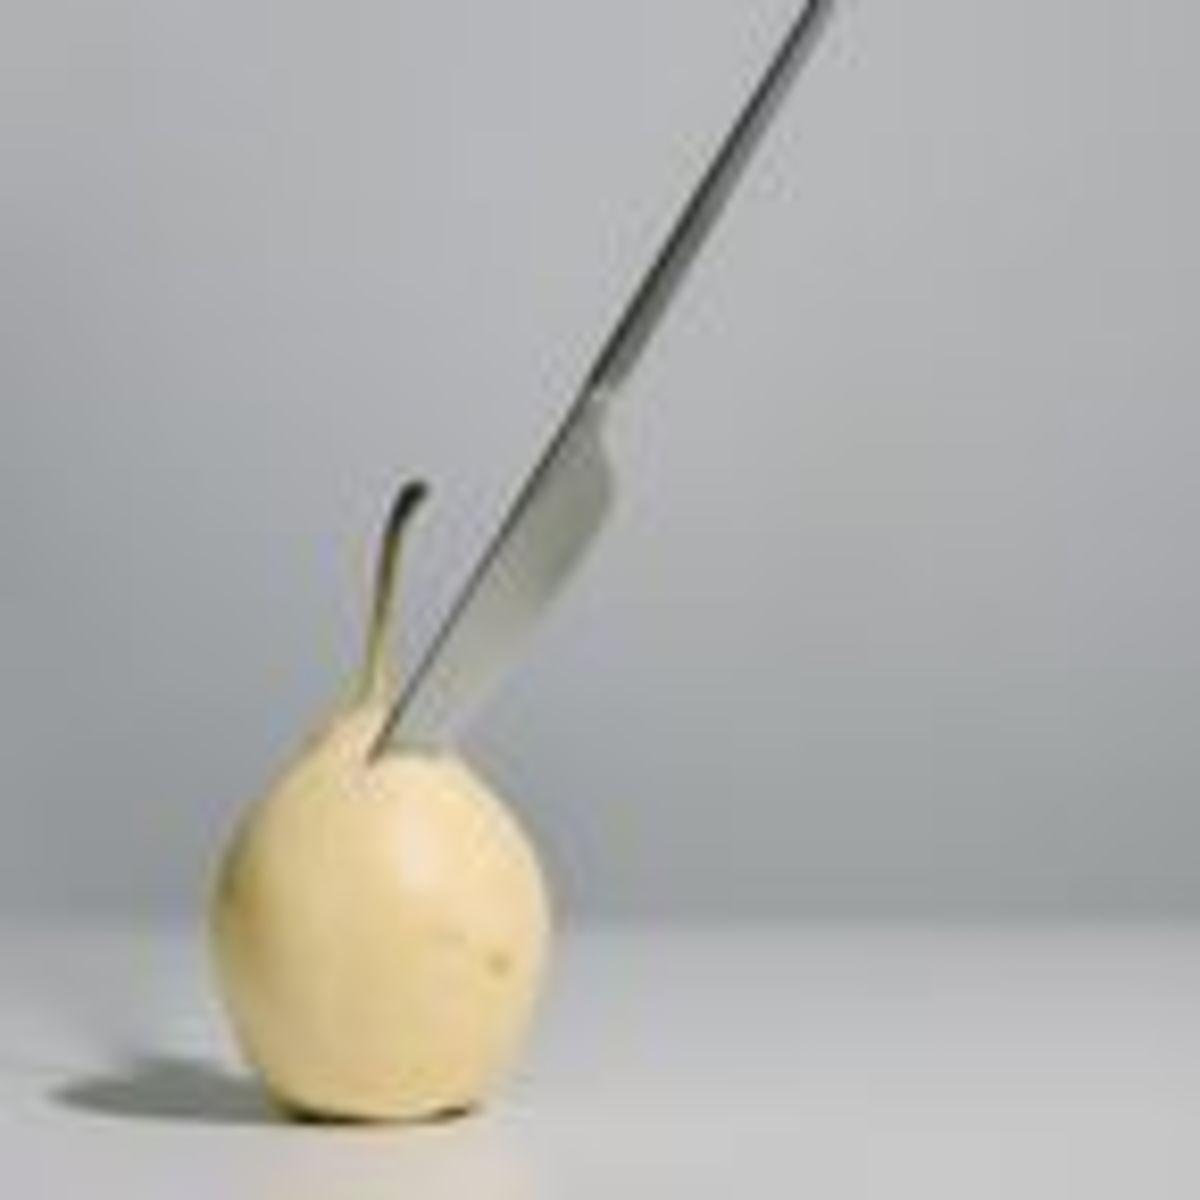 🌷 eating disorders ruin relationships